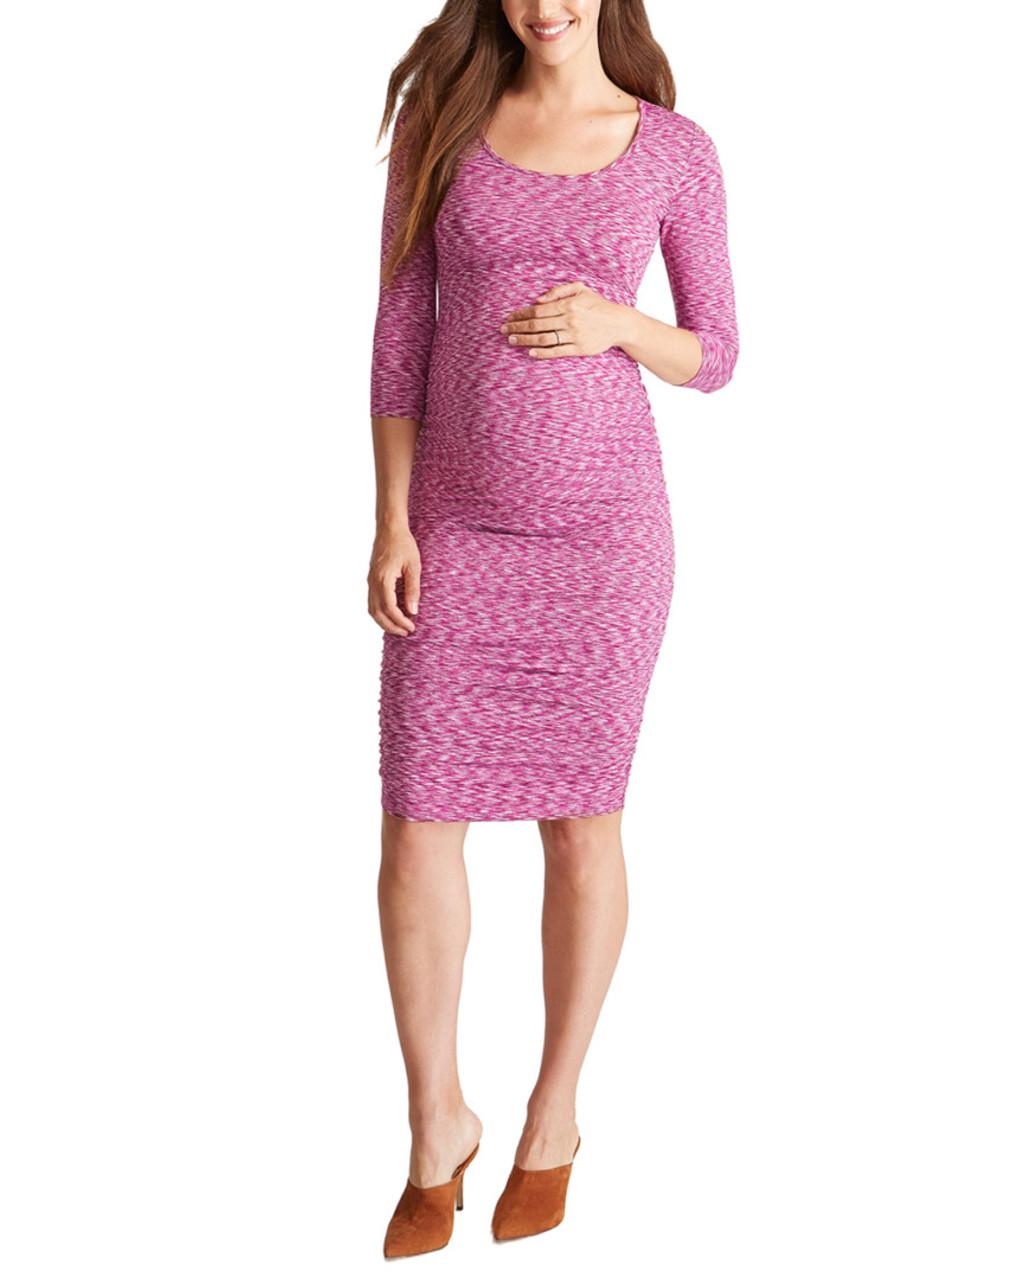 087cd5fbb17 Ingrid   Isabel Maternity 3 4 Sleeve Shirred Dress~1050009058 ...